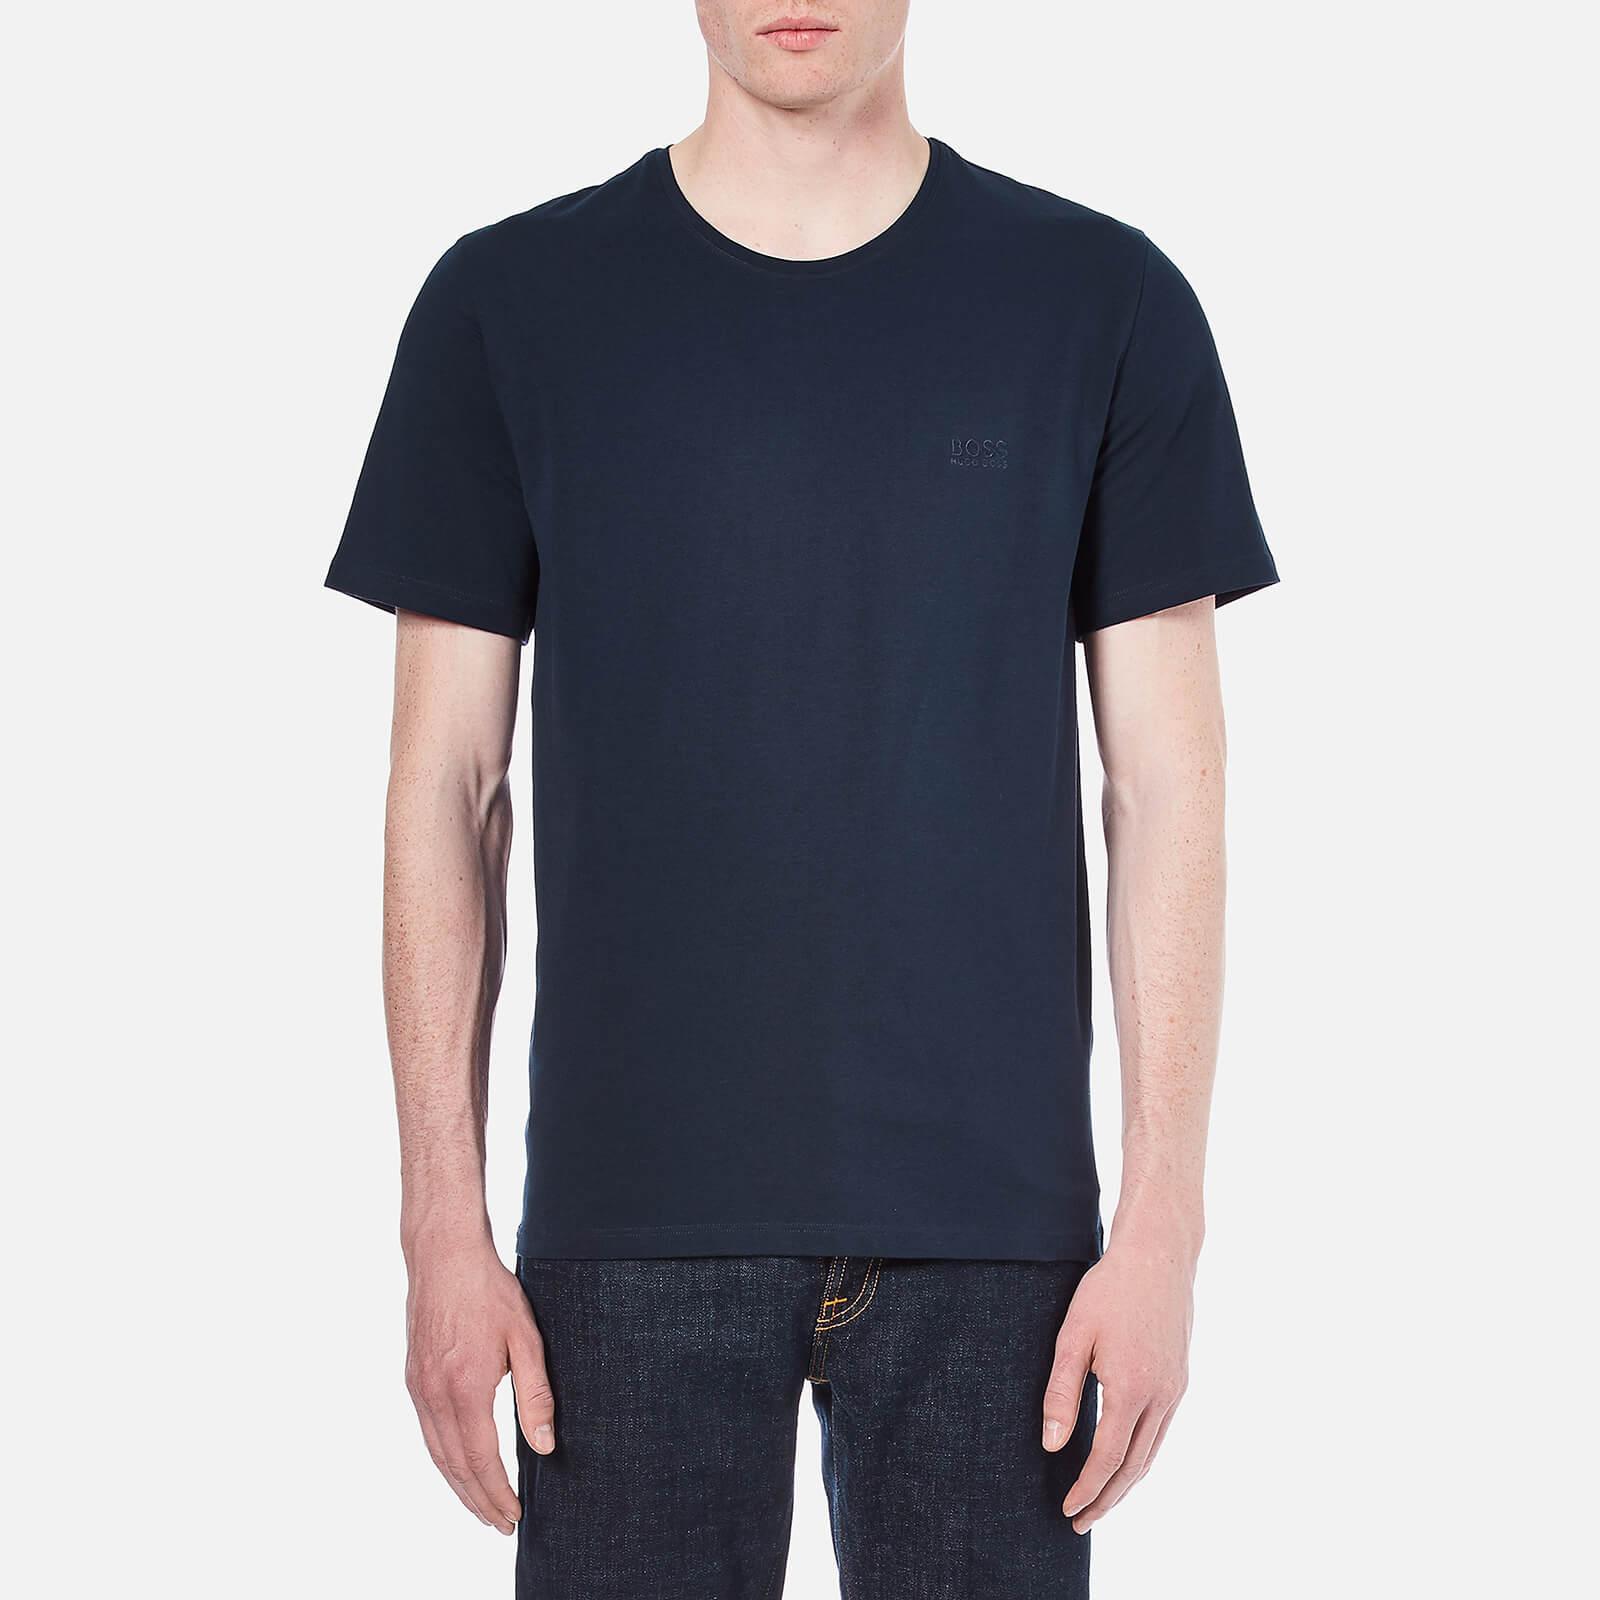 61534486f BOSS Hugo Boss Men's Small Logo Crew Neck T-Shirt - Navy Clothing |  TheHut.com